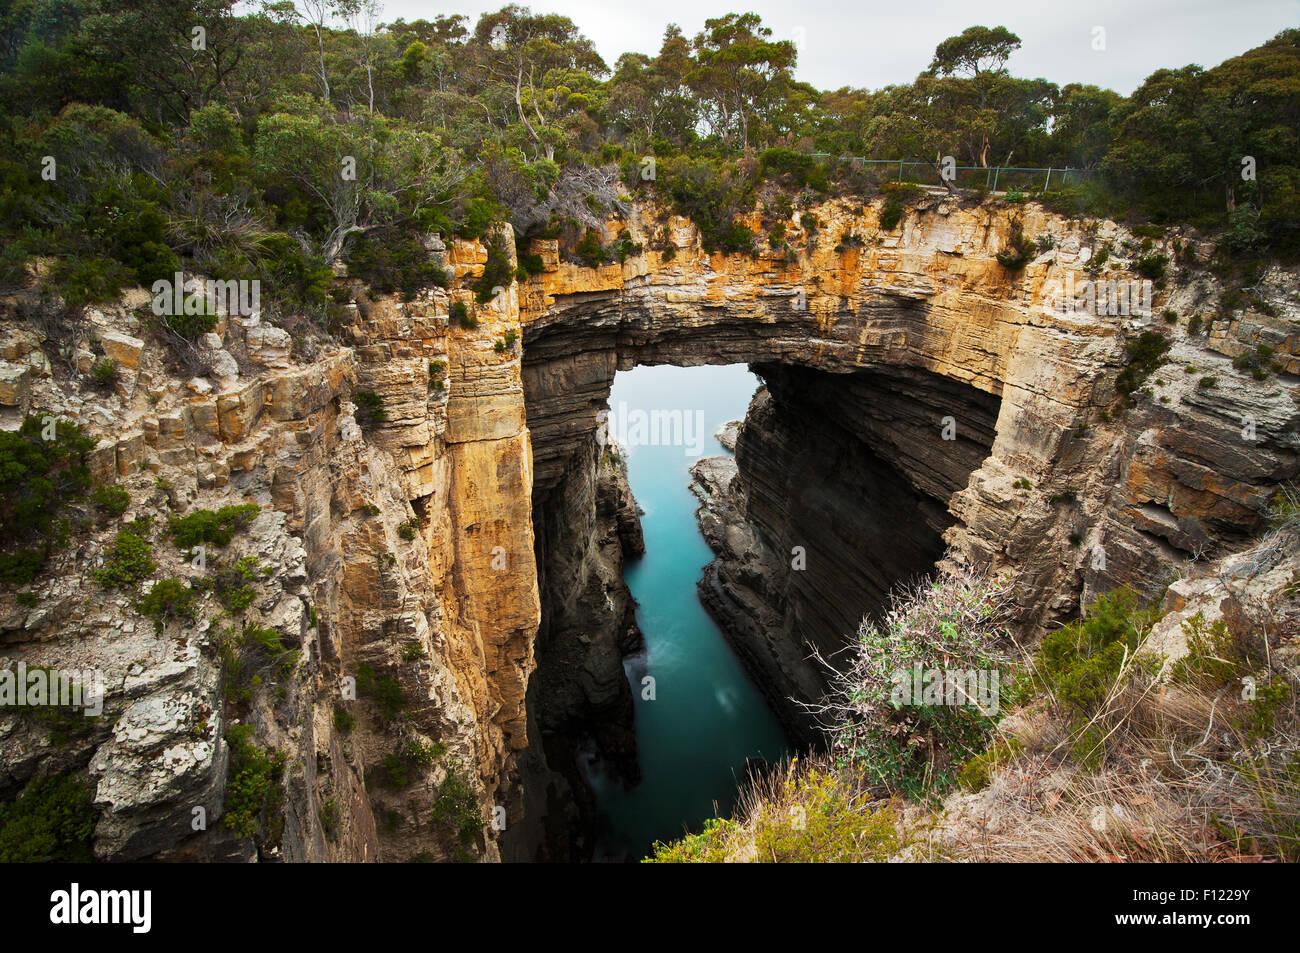 Impressing rocky bridge of Tasman Arch. - Stock Image